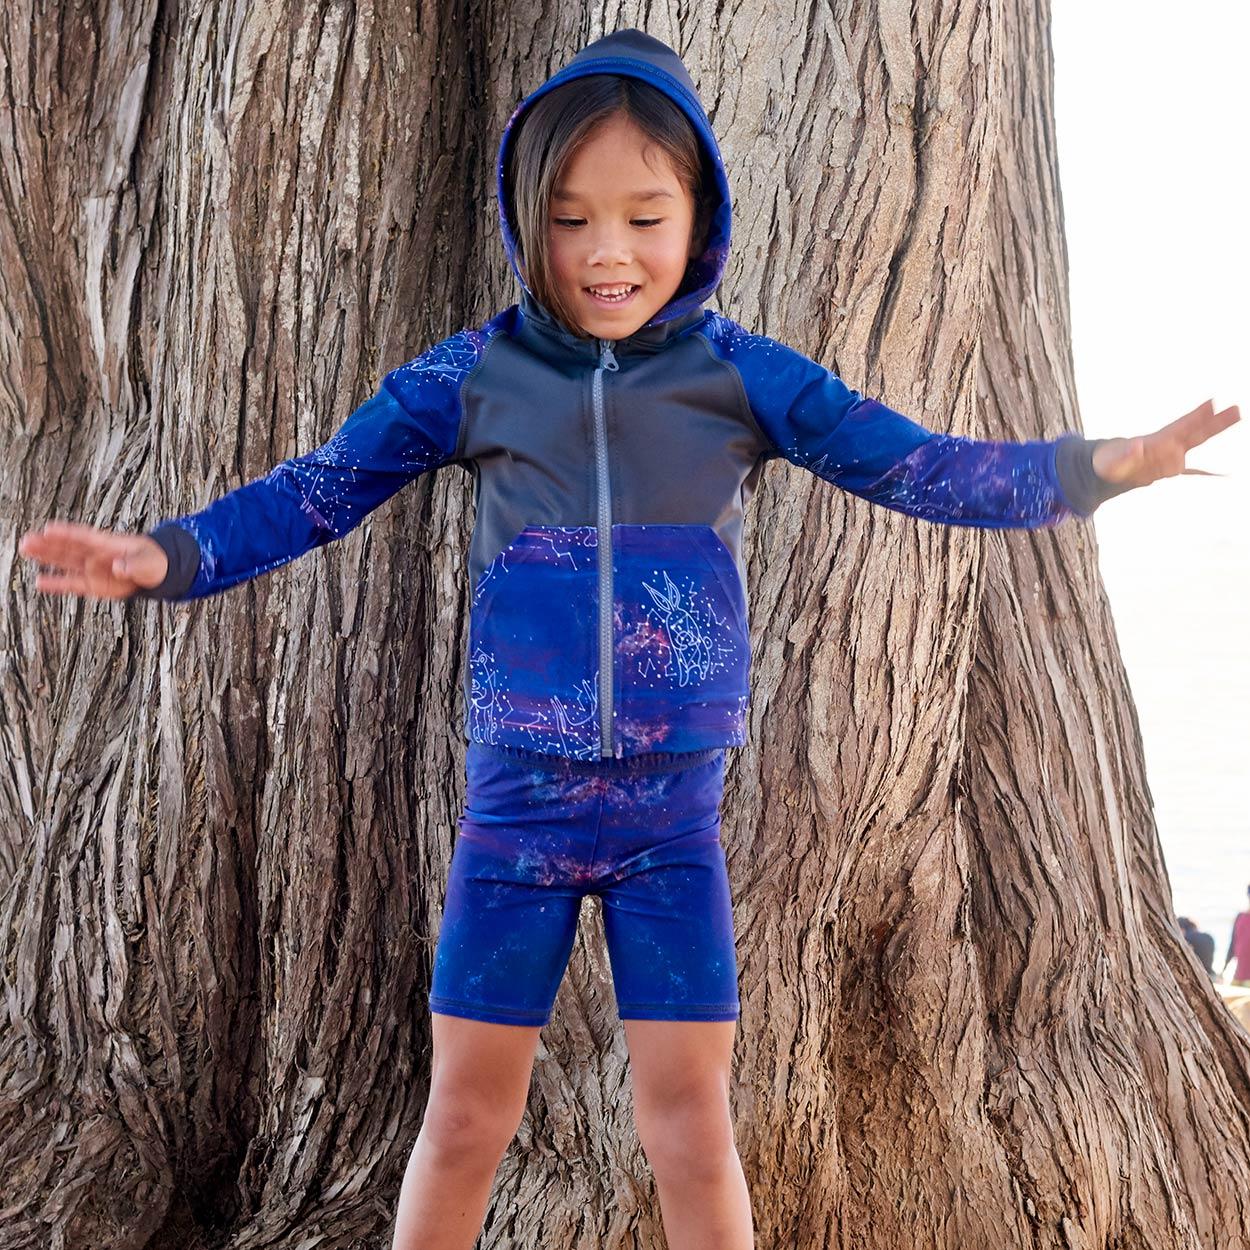 Cosmos Sunblocker Shorts Upf50 Kids Boys Girls Size 2 12 Purple Unisex Girl On The Beach Balancing On Tree Roots Sunpoplife